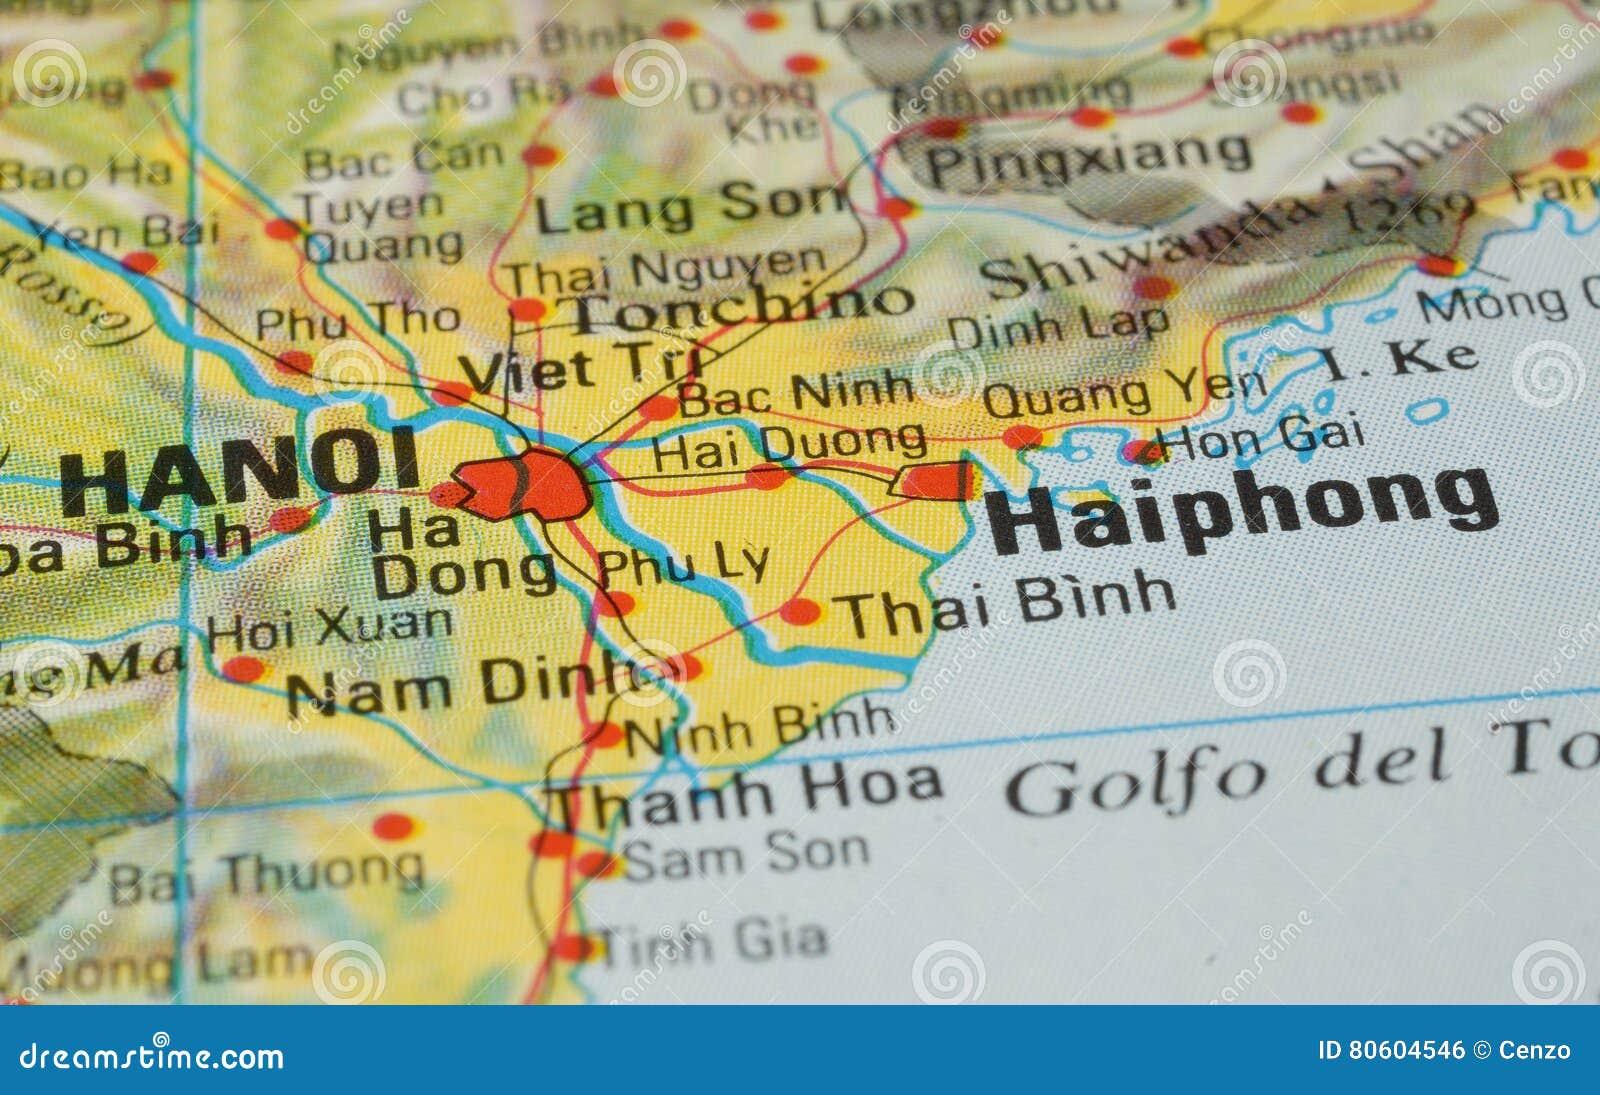 Ha Noi Vietnam Map.Hanoi Road Map Stock Photo Image Of Minh Vietnam Tourism 80604546